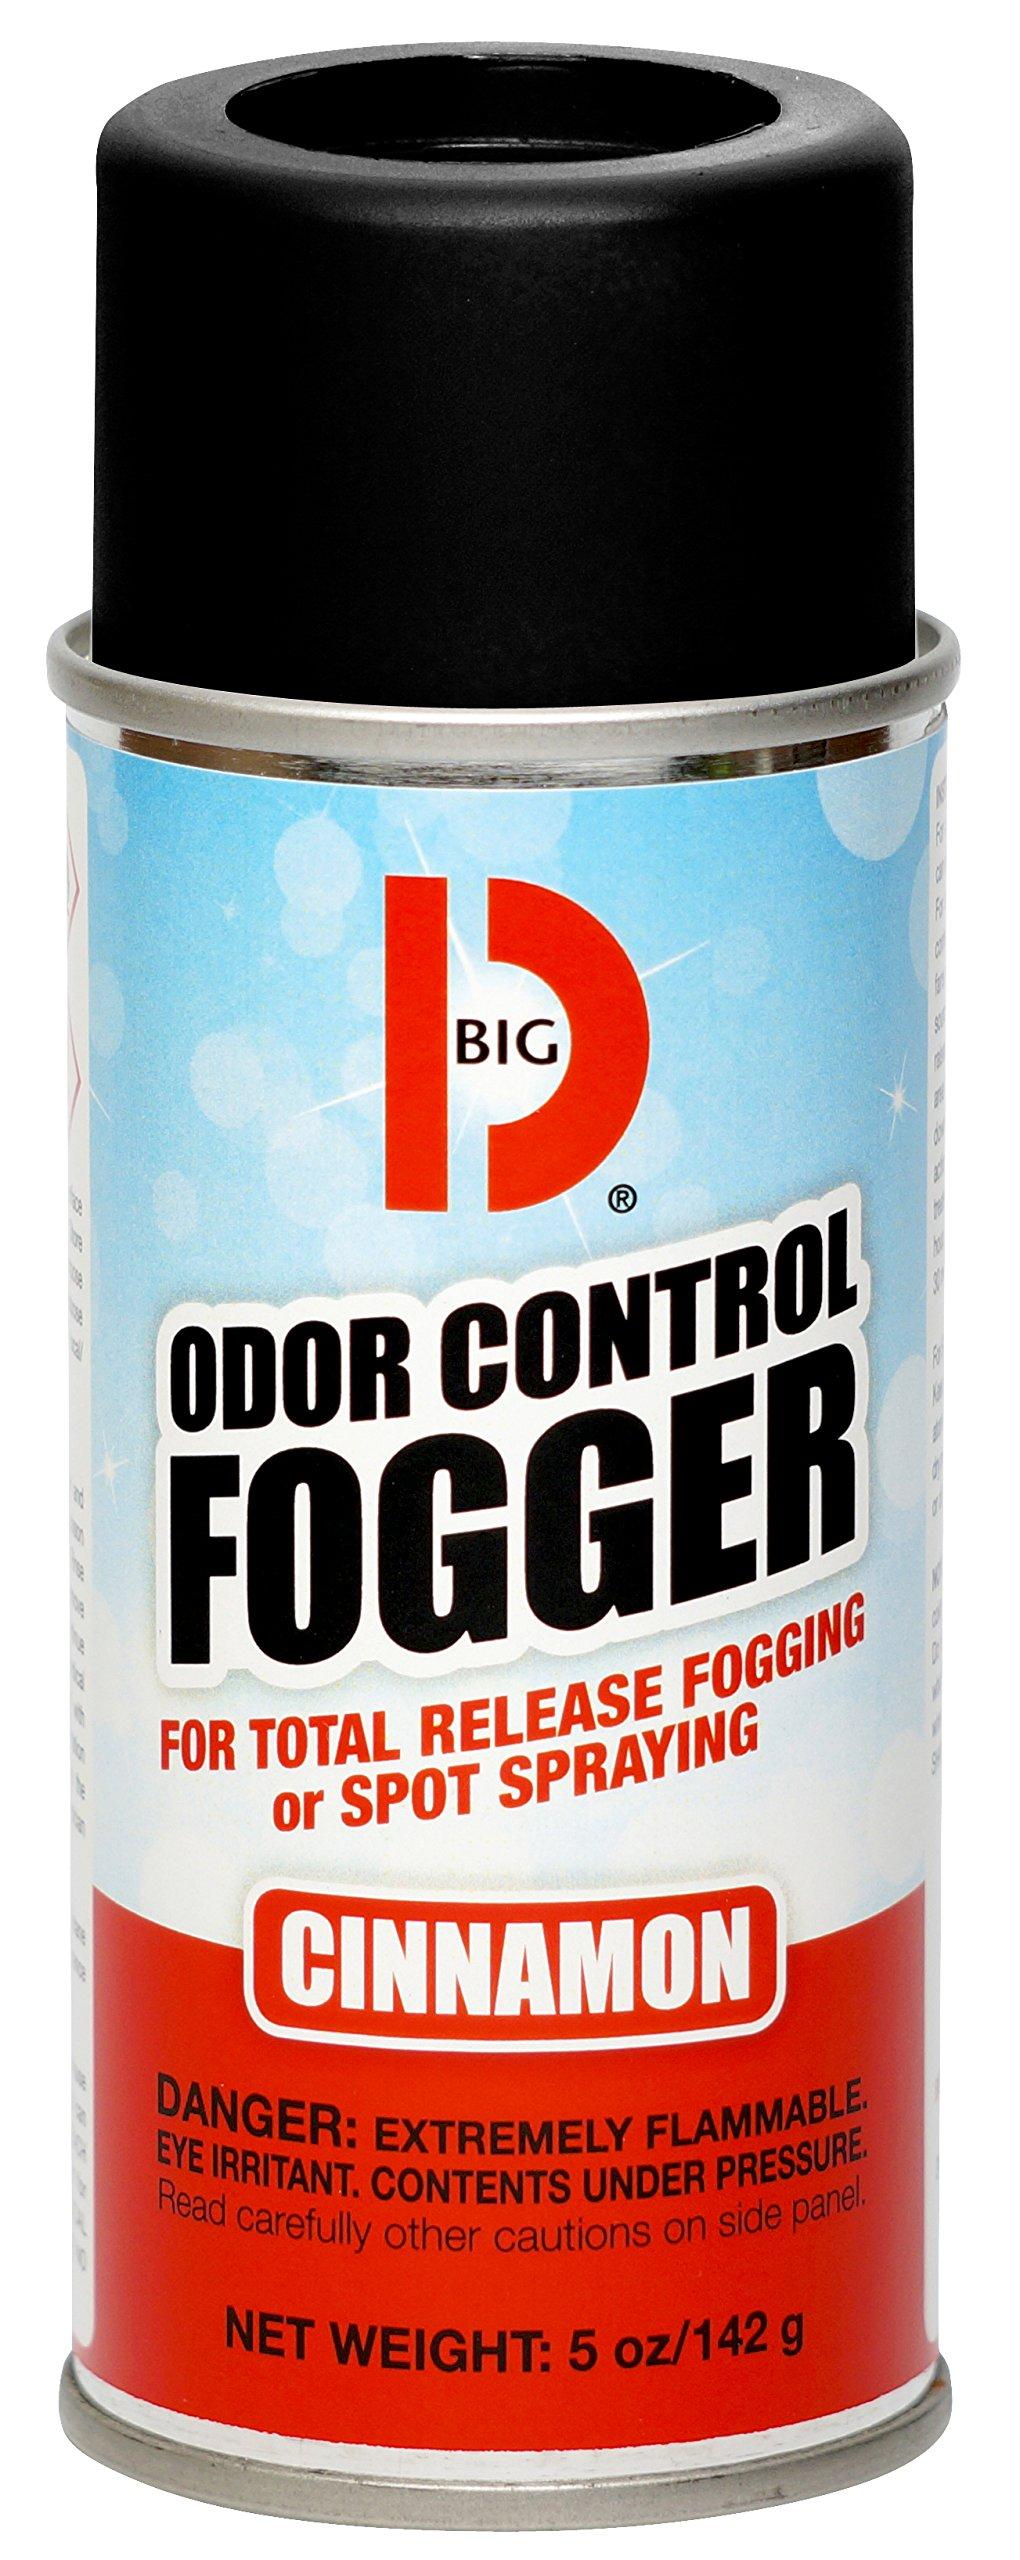 Big D Cinnamon Odor Control Fogger 5oz Can - 1 Can